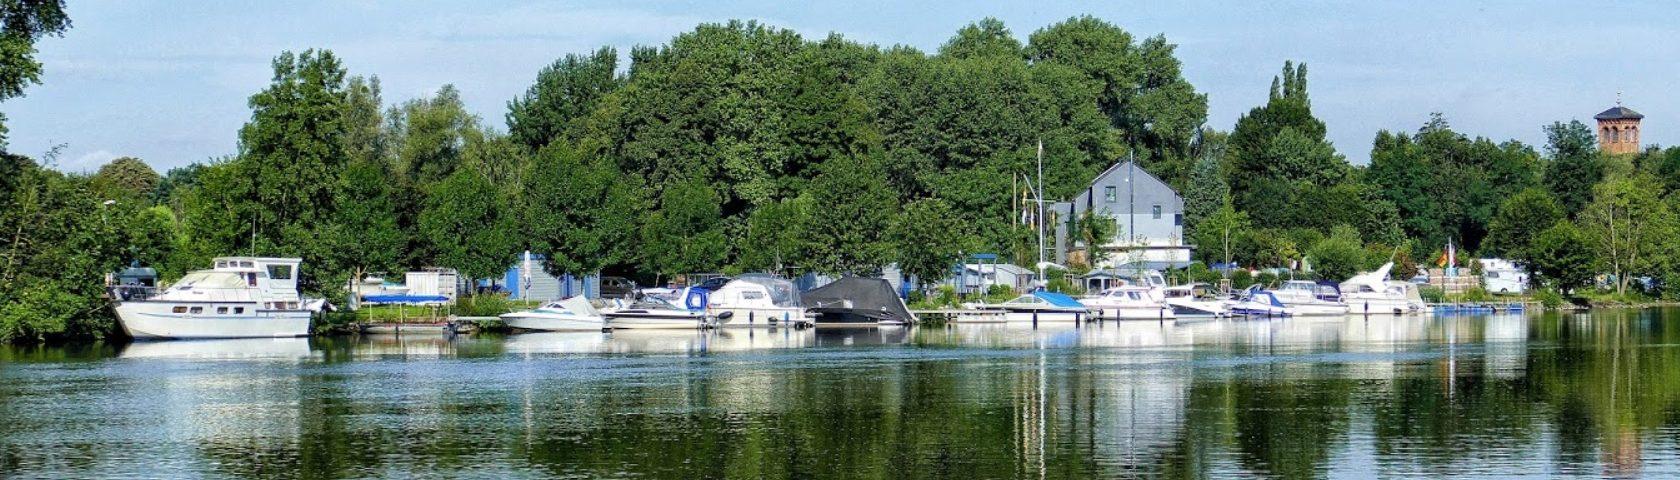 Jachtclub HBC in Hanau. (Foto HBC)